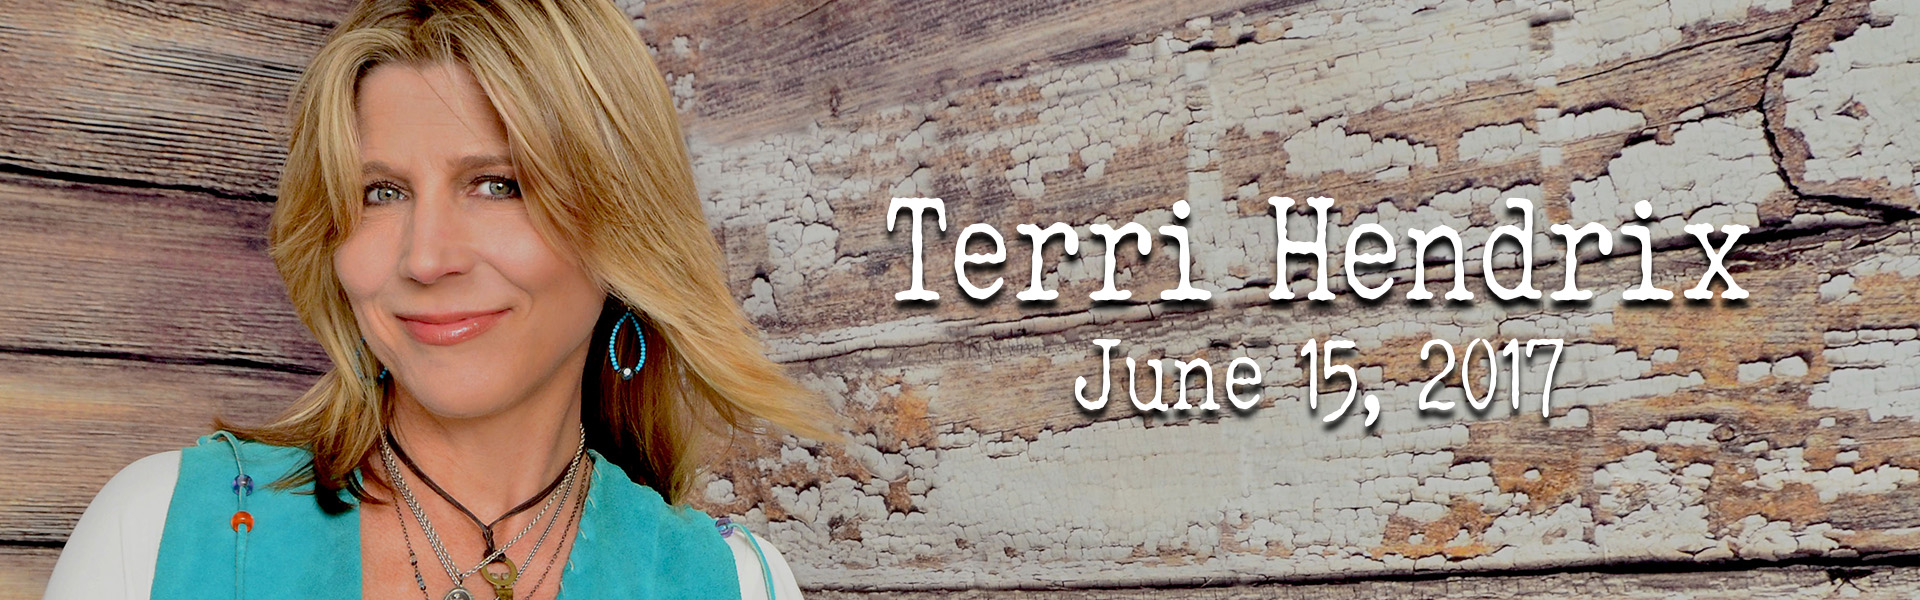 Terri-Hendrix-Banner